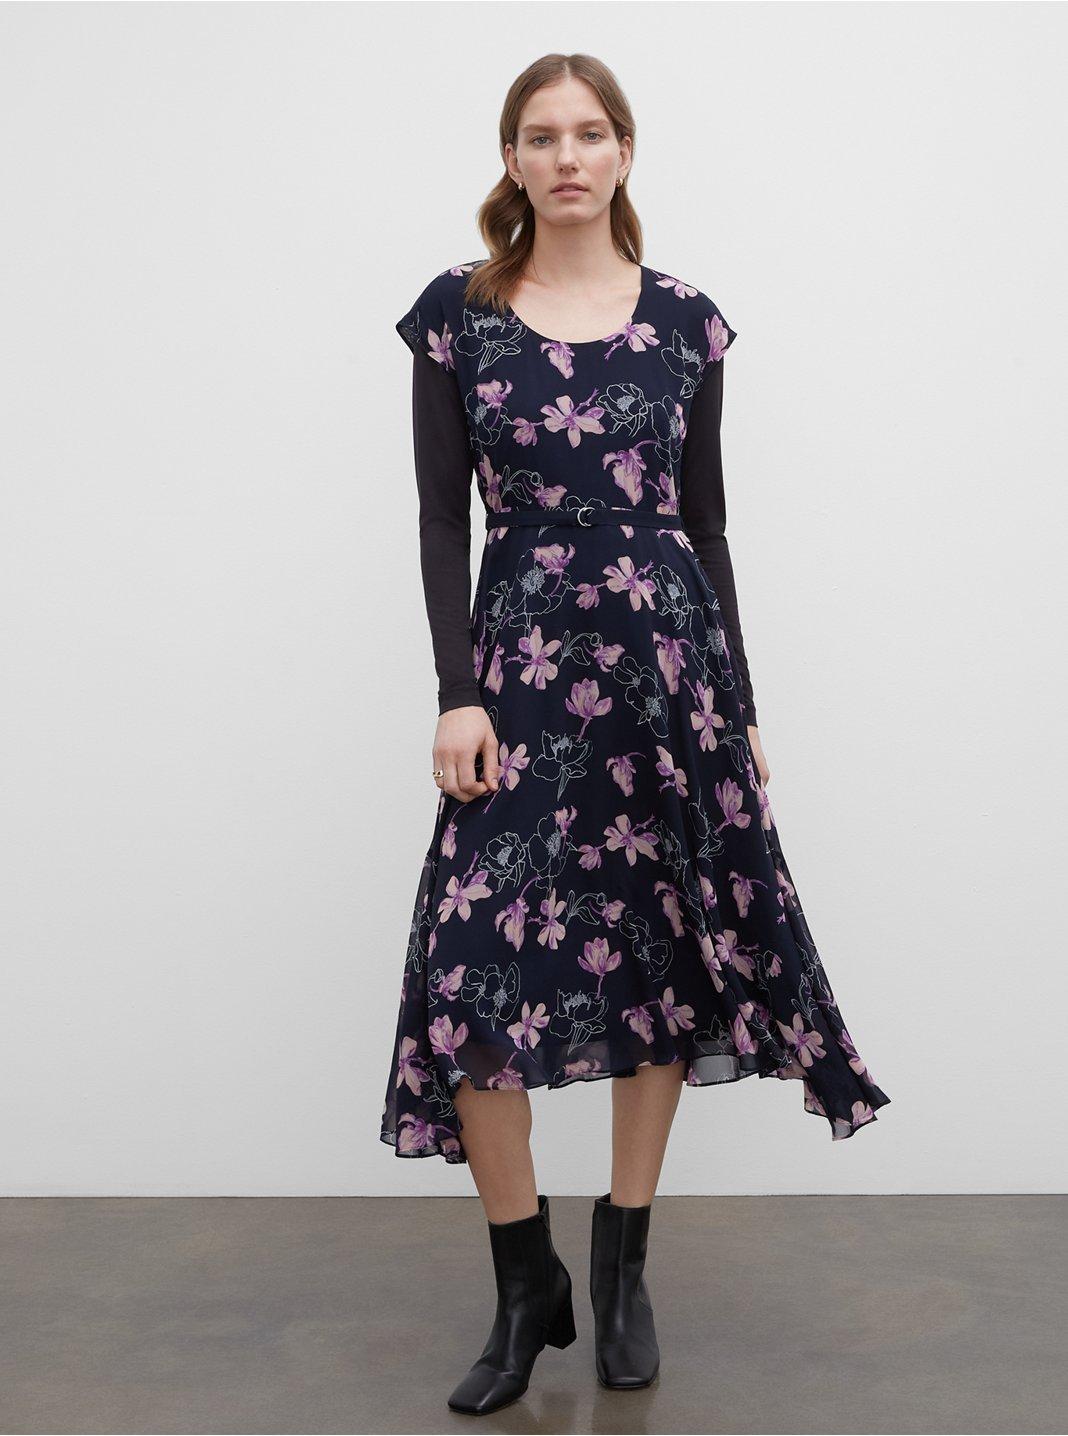 Soft Print Dress